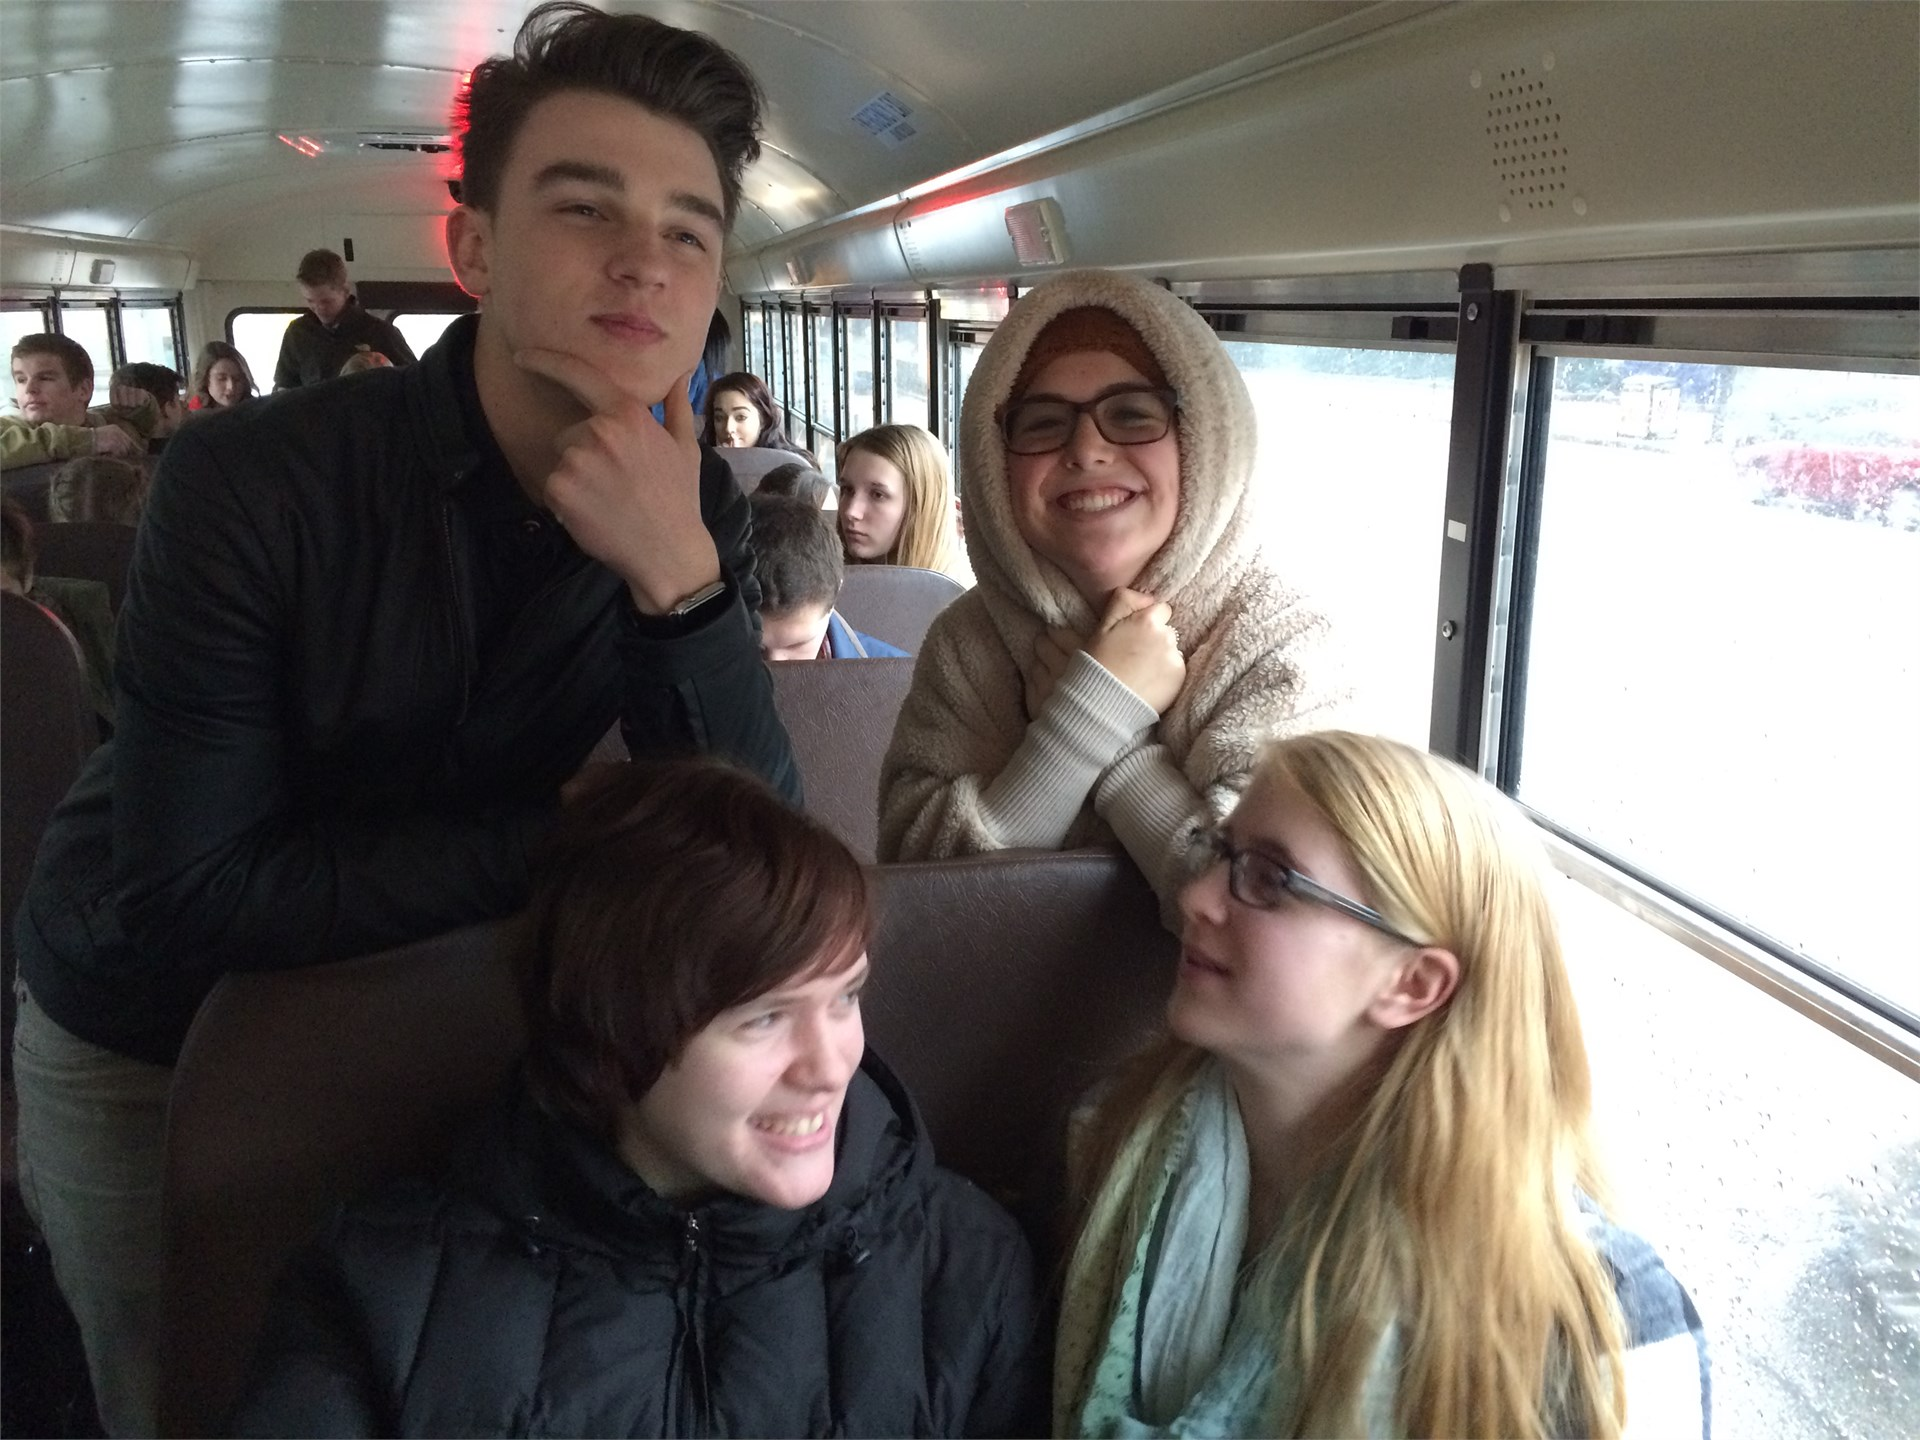 Geneva 304 students on the road